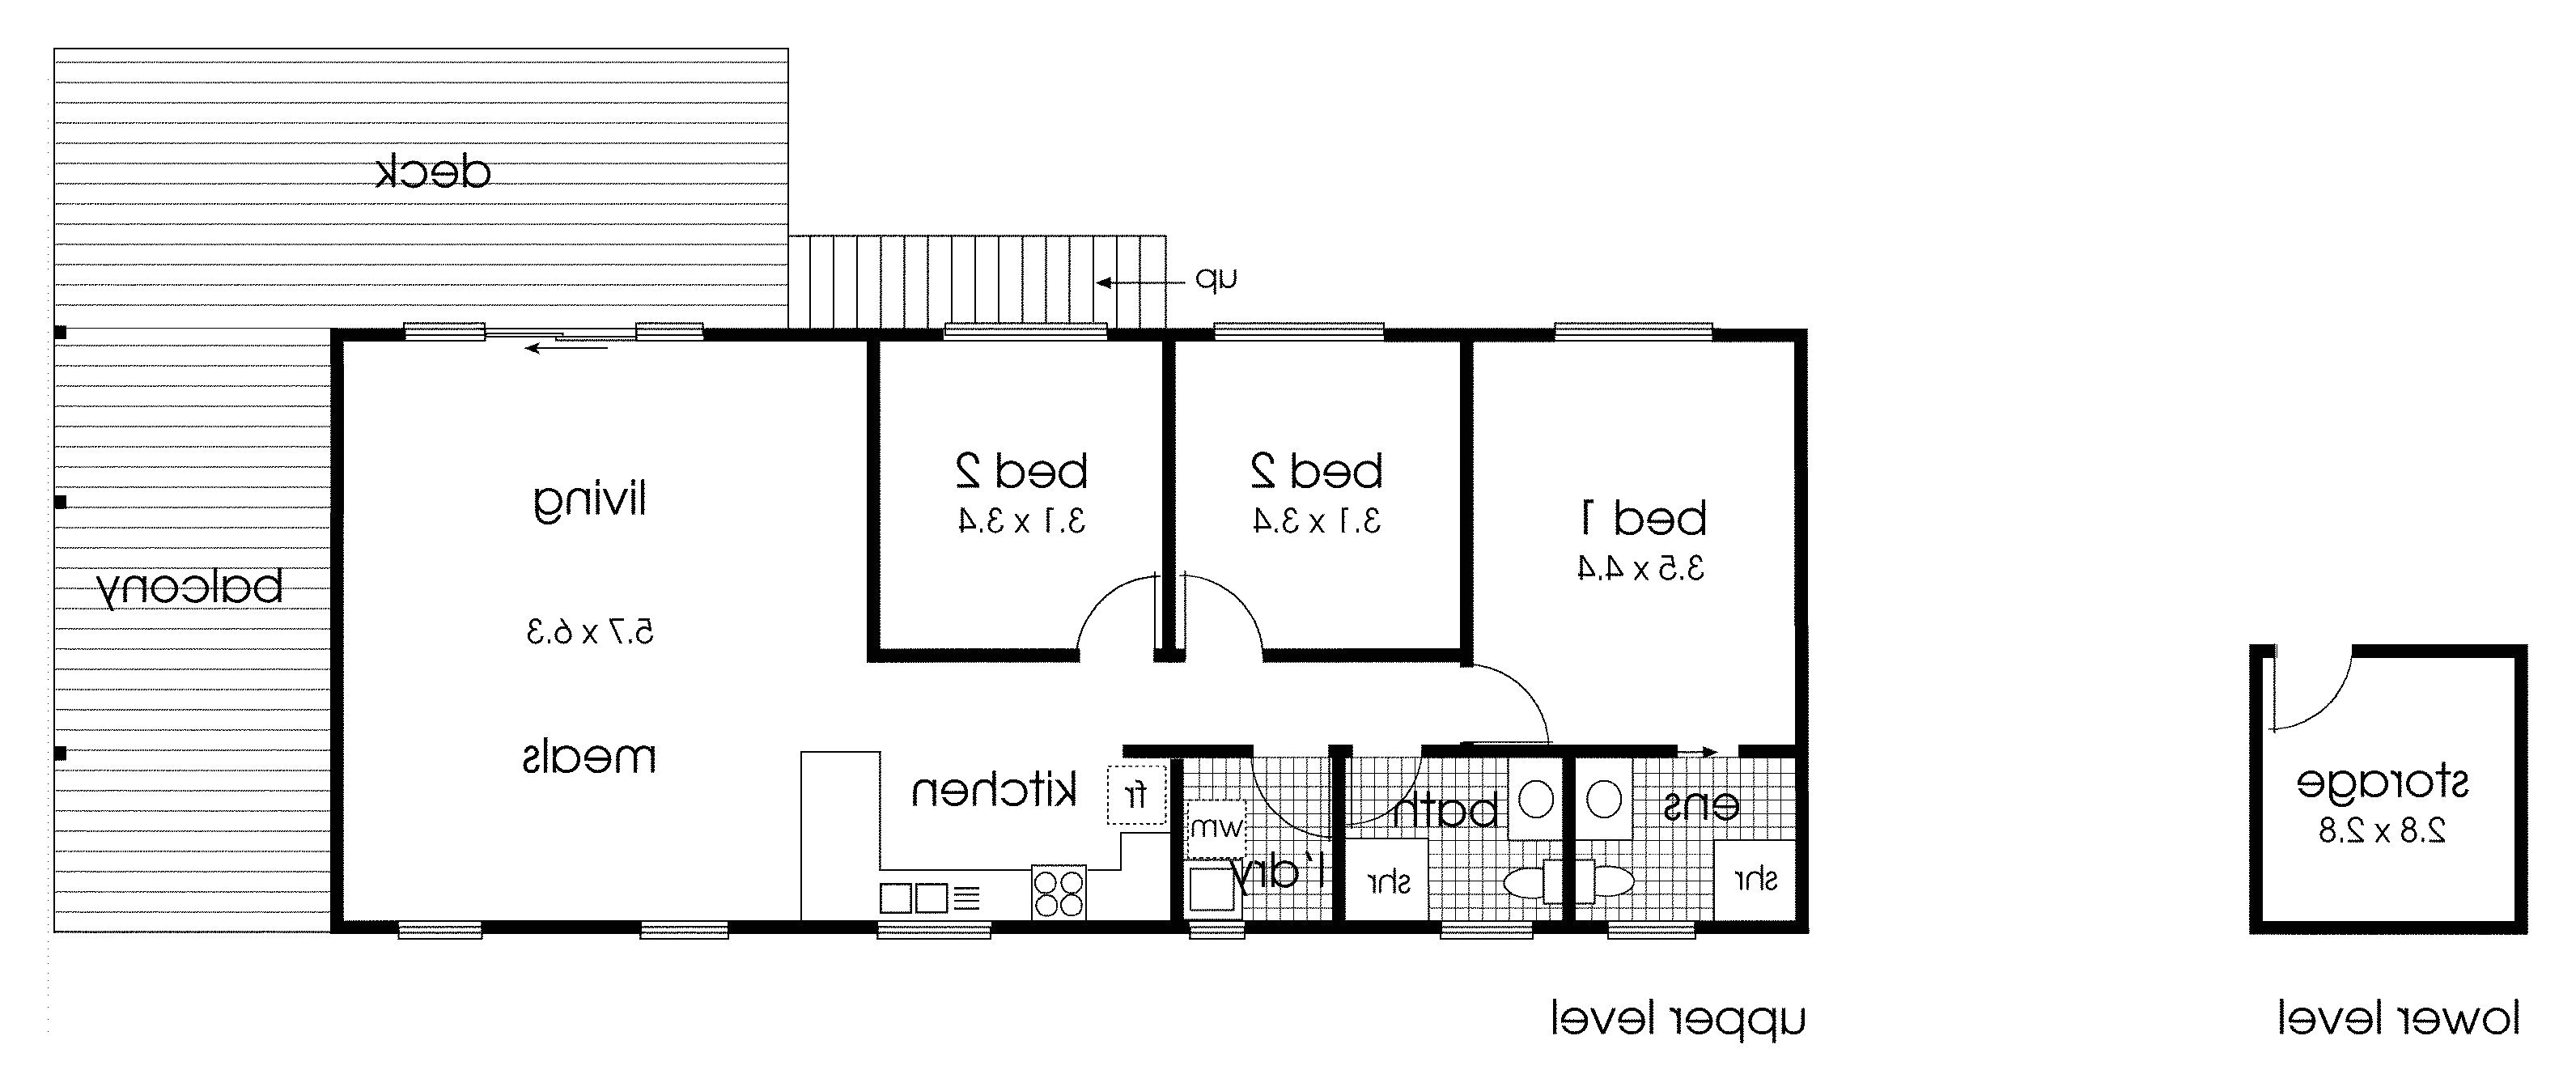 oak creek homes floor plans new drawing floor plans with sketchup inspirational home design software 22